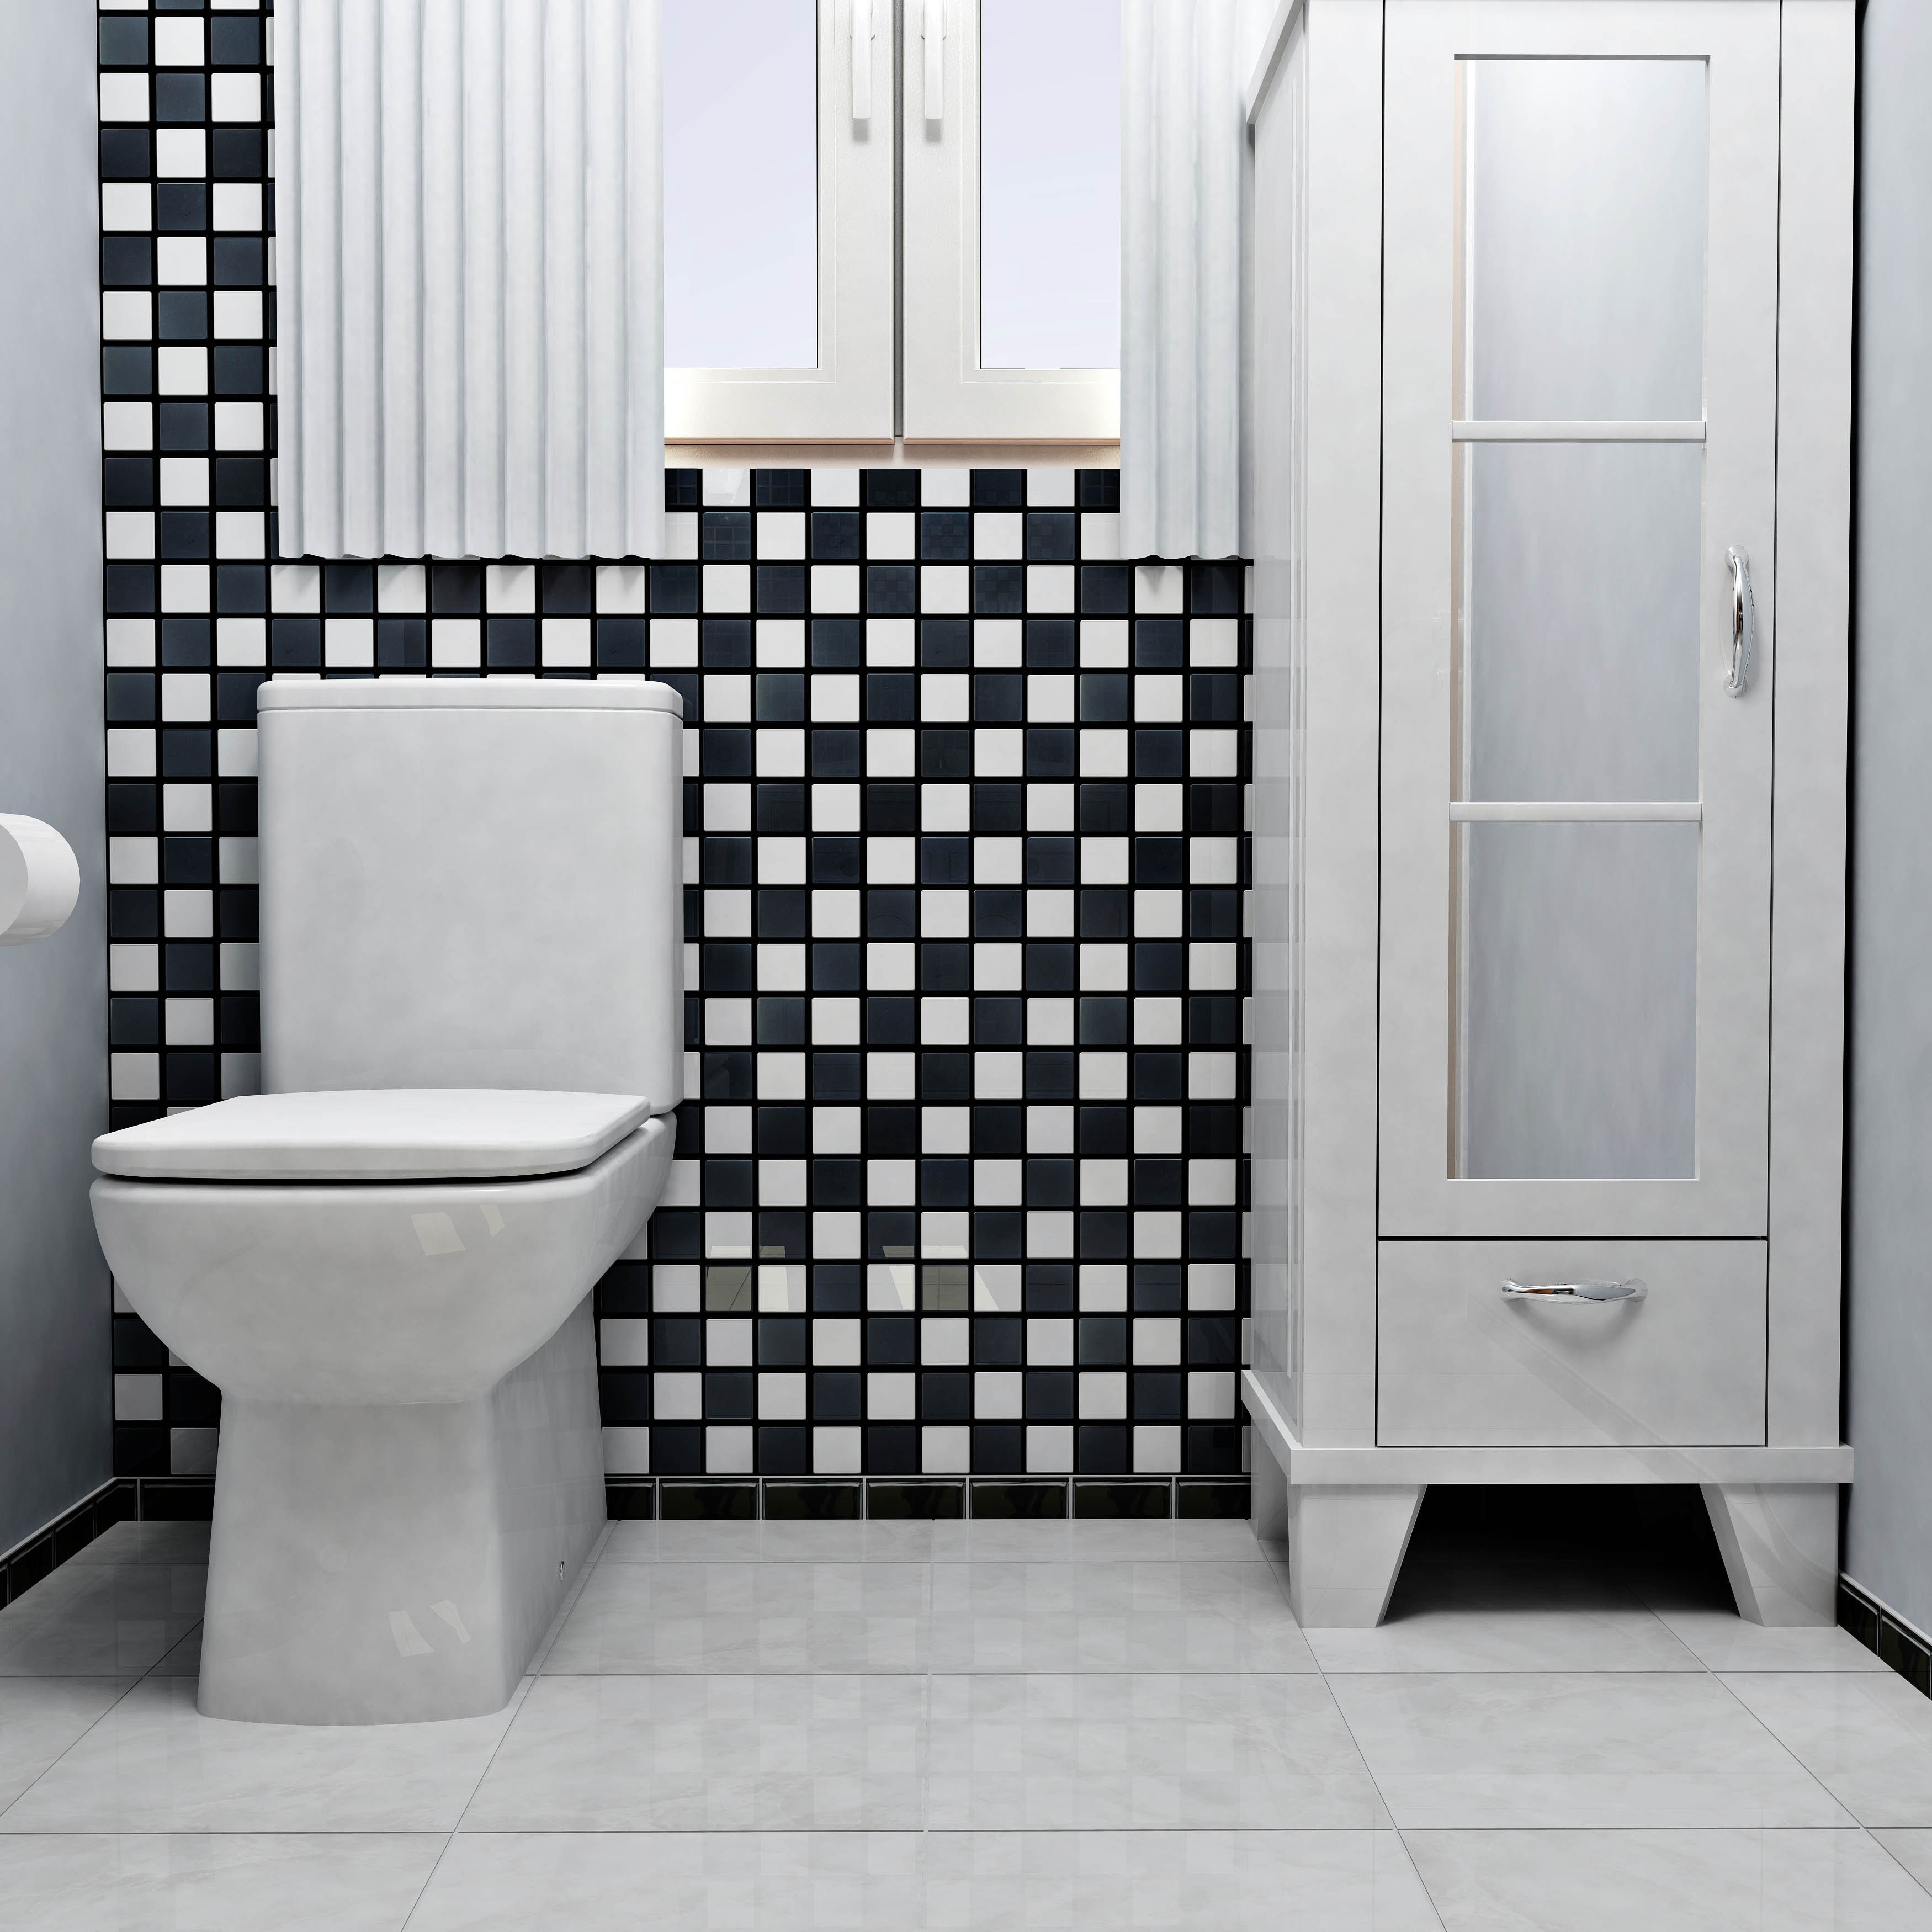 Shop Somertile 125x125 Knight Quad Checkerboard Porcelain Mosaic